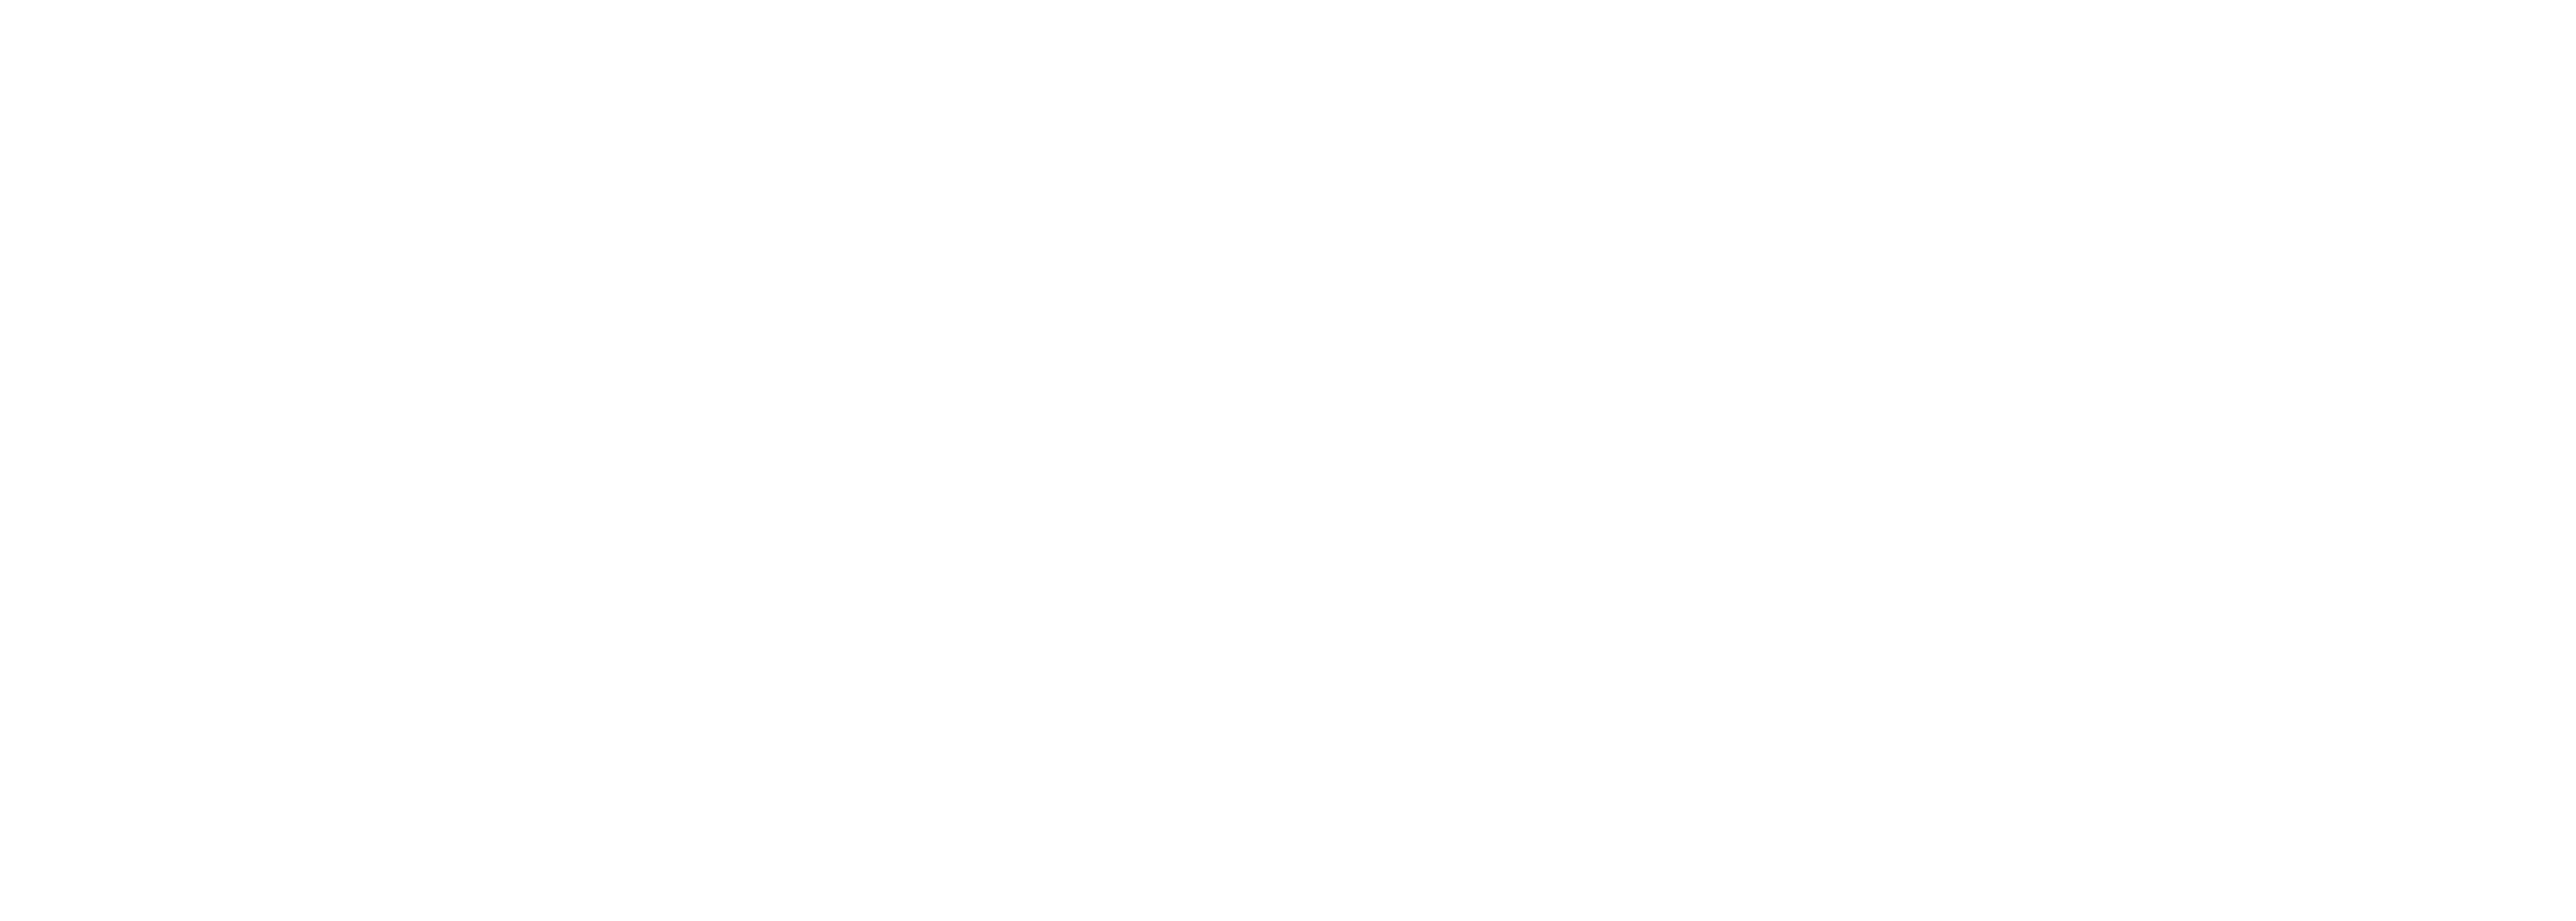 Restaurant Recovery Summit Community